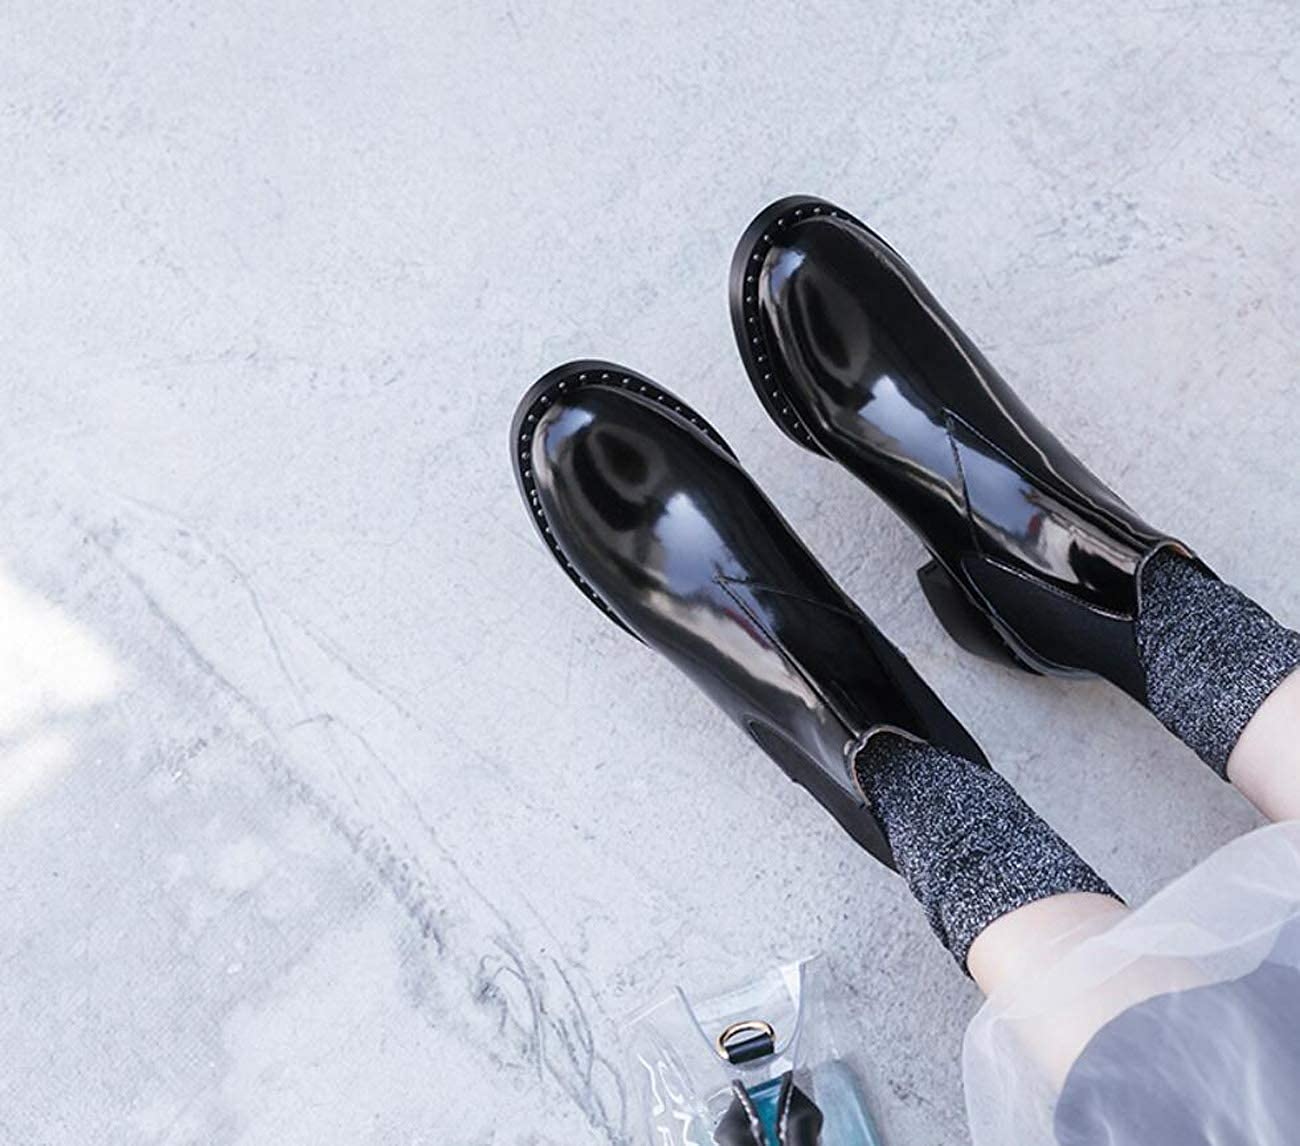 DANDANJIE Female Martin Boots Autumn Winter British Style Fashion Black Booties